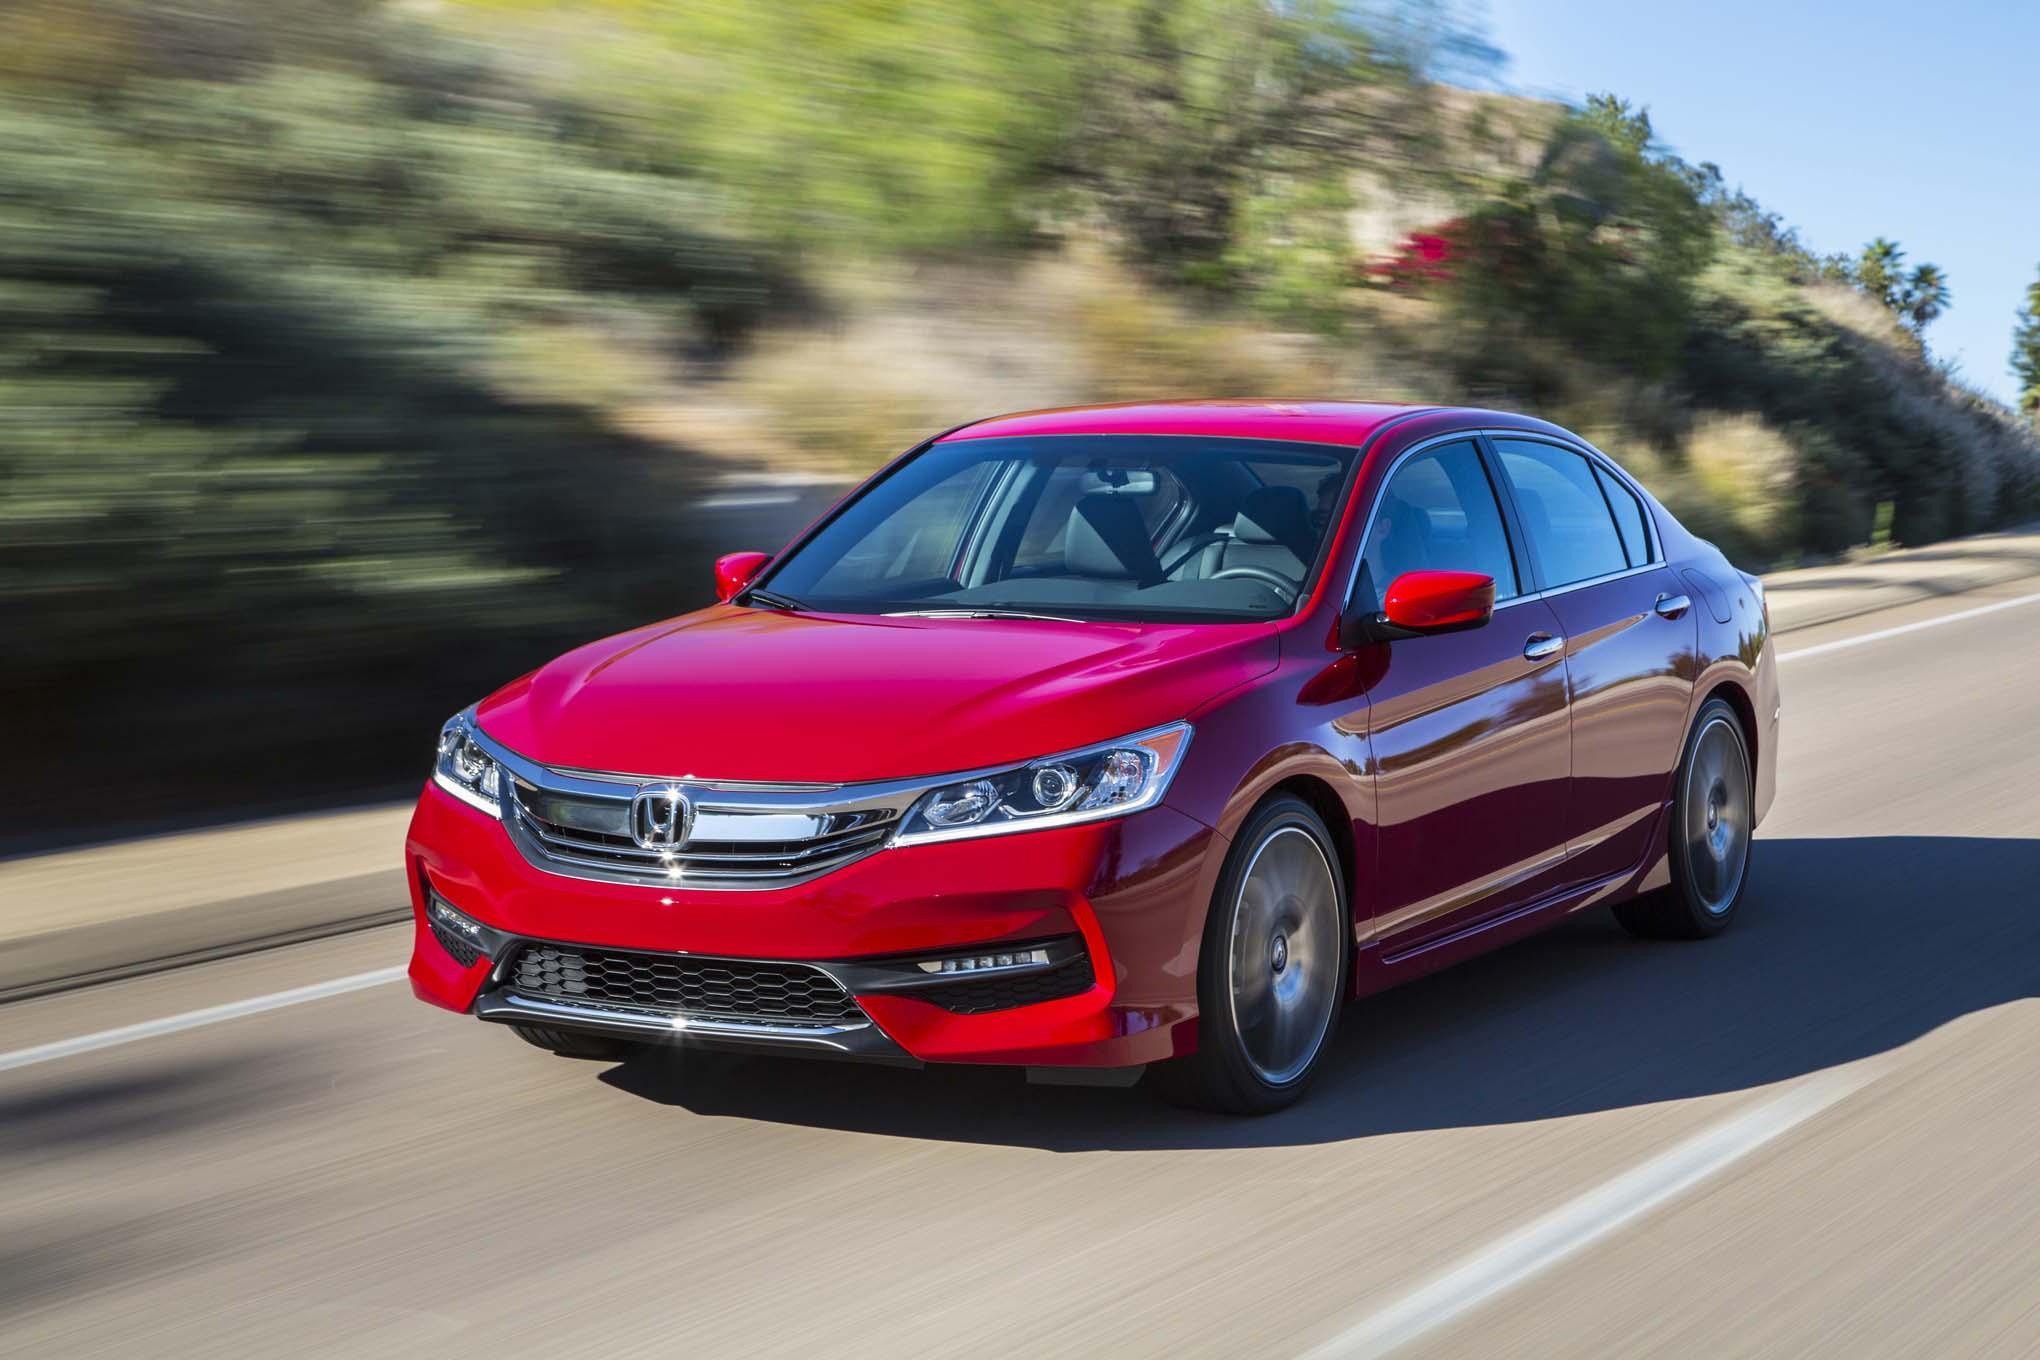 2017 Honda Accord For Sale near Citrus Heights | Mel Rapton Honda